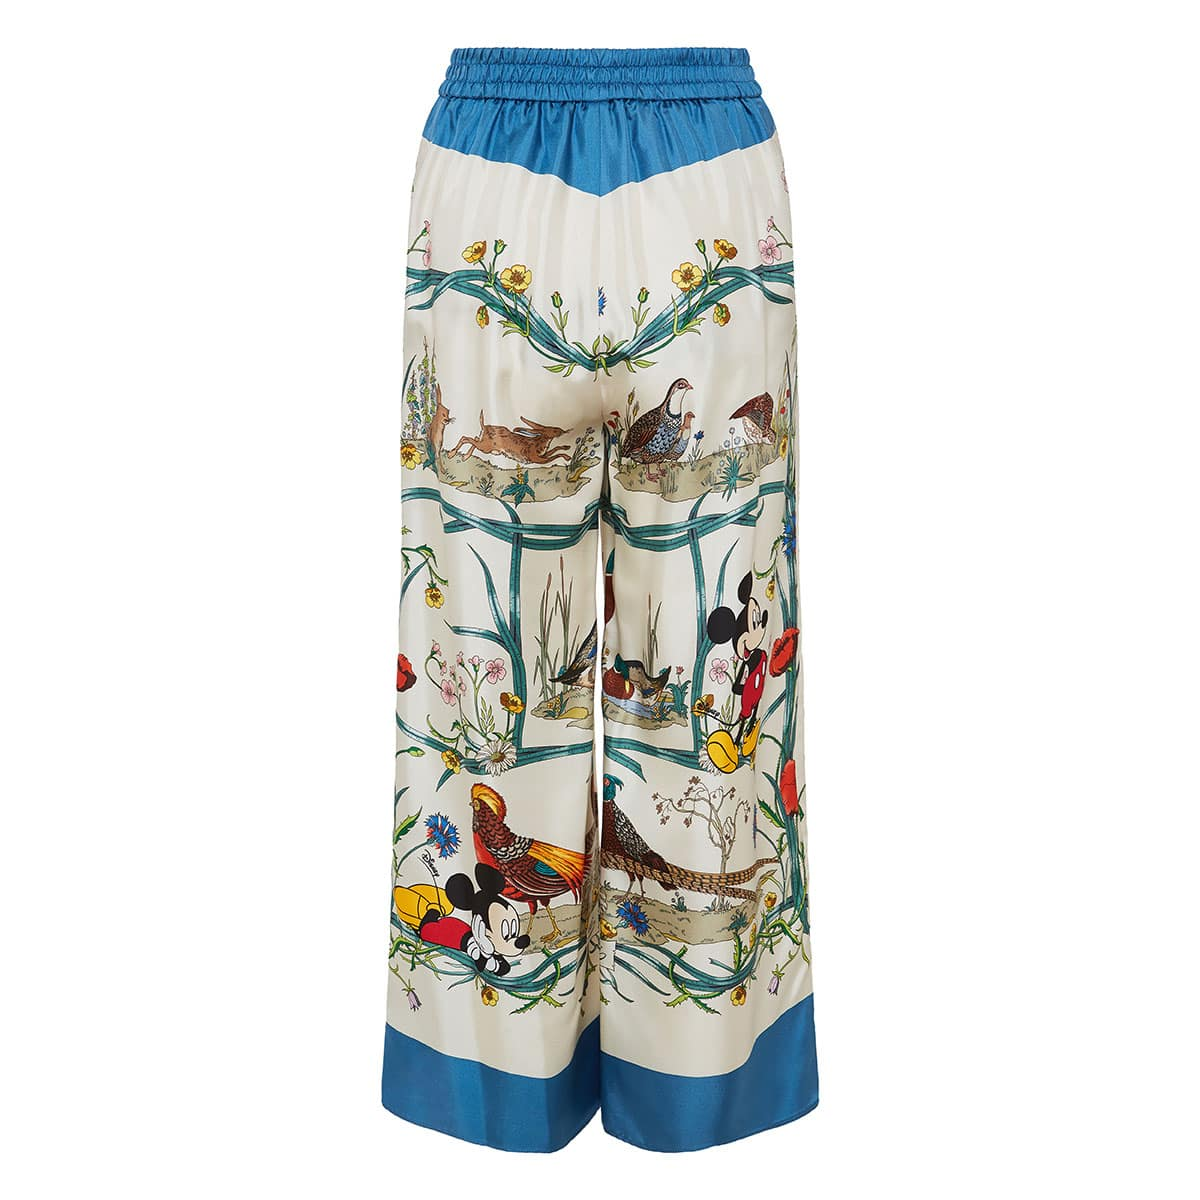 Disney x Gucci printed pyjama trousers